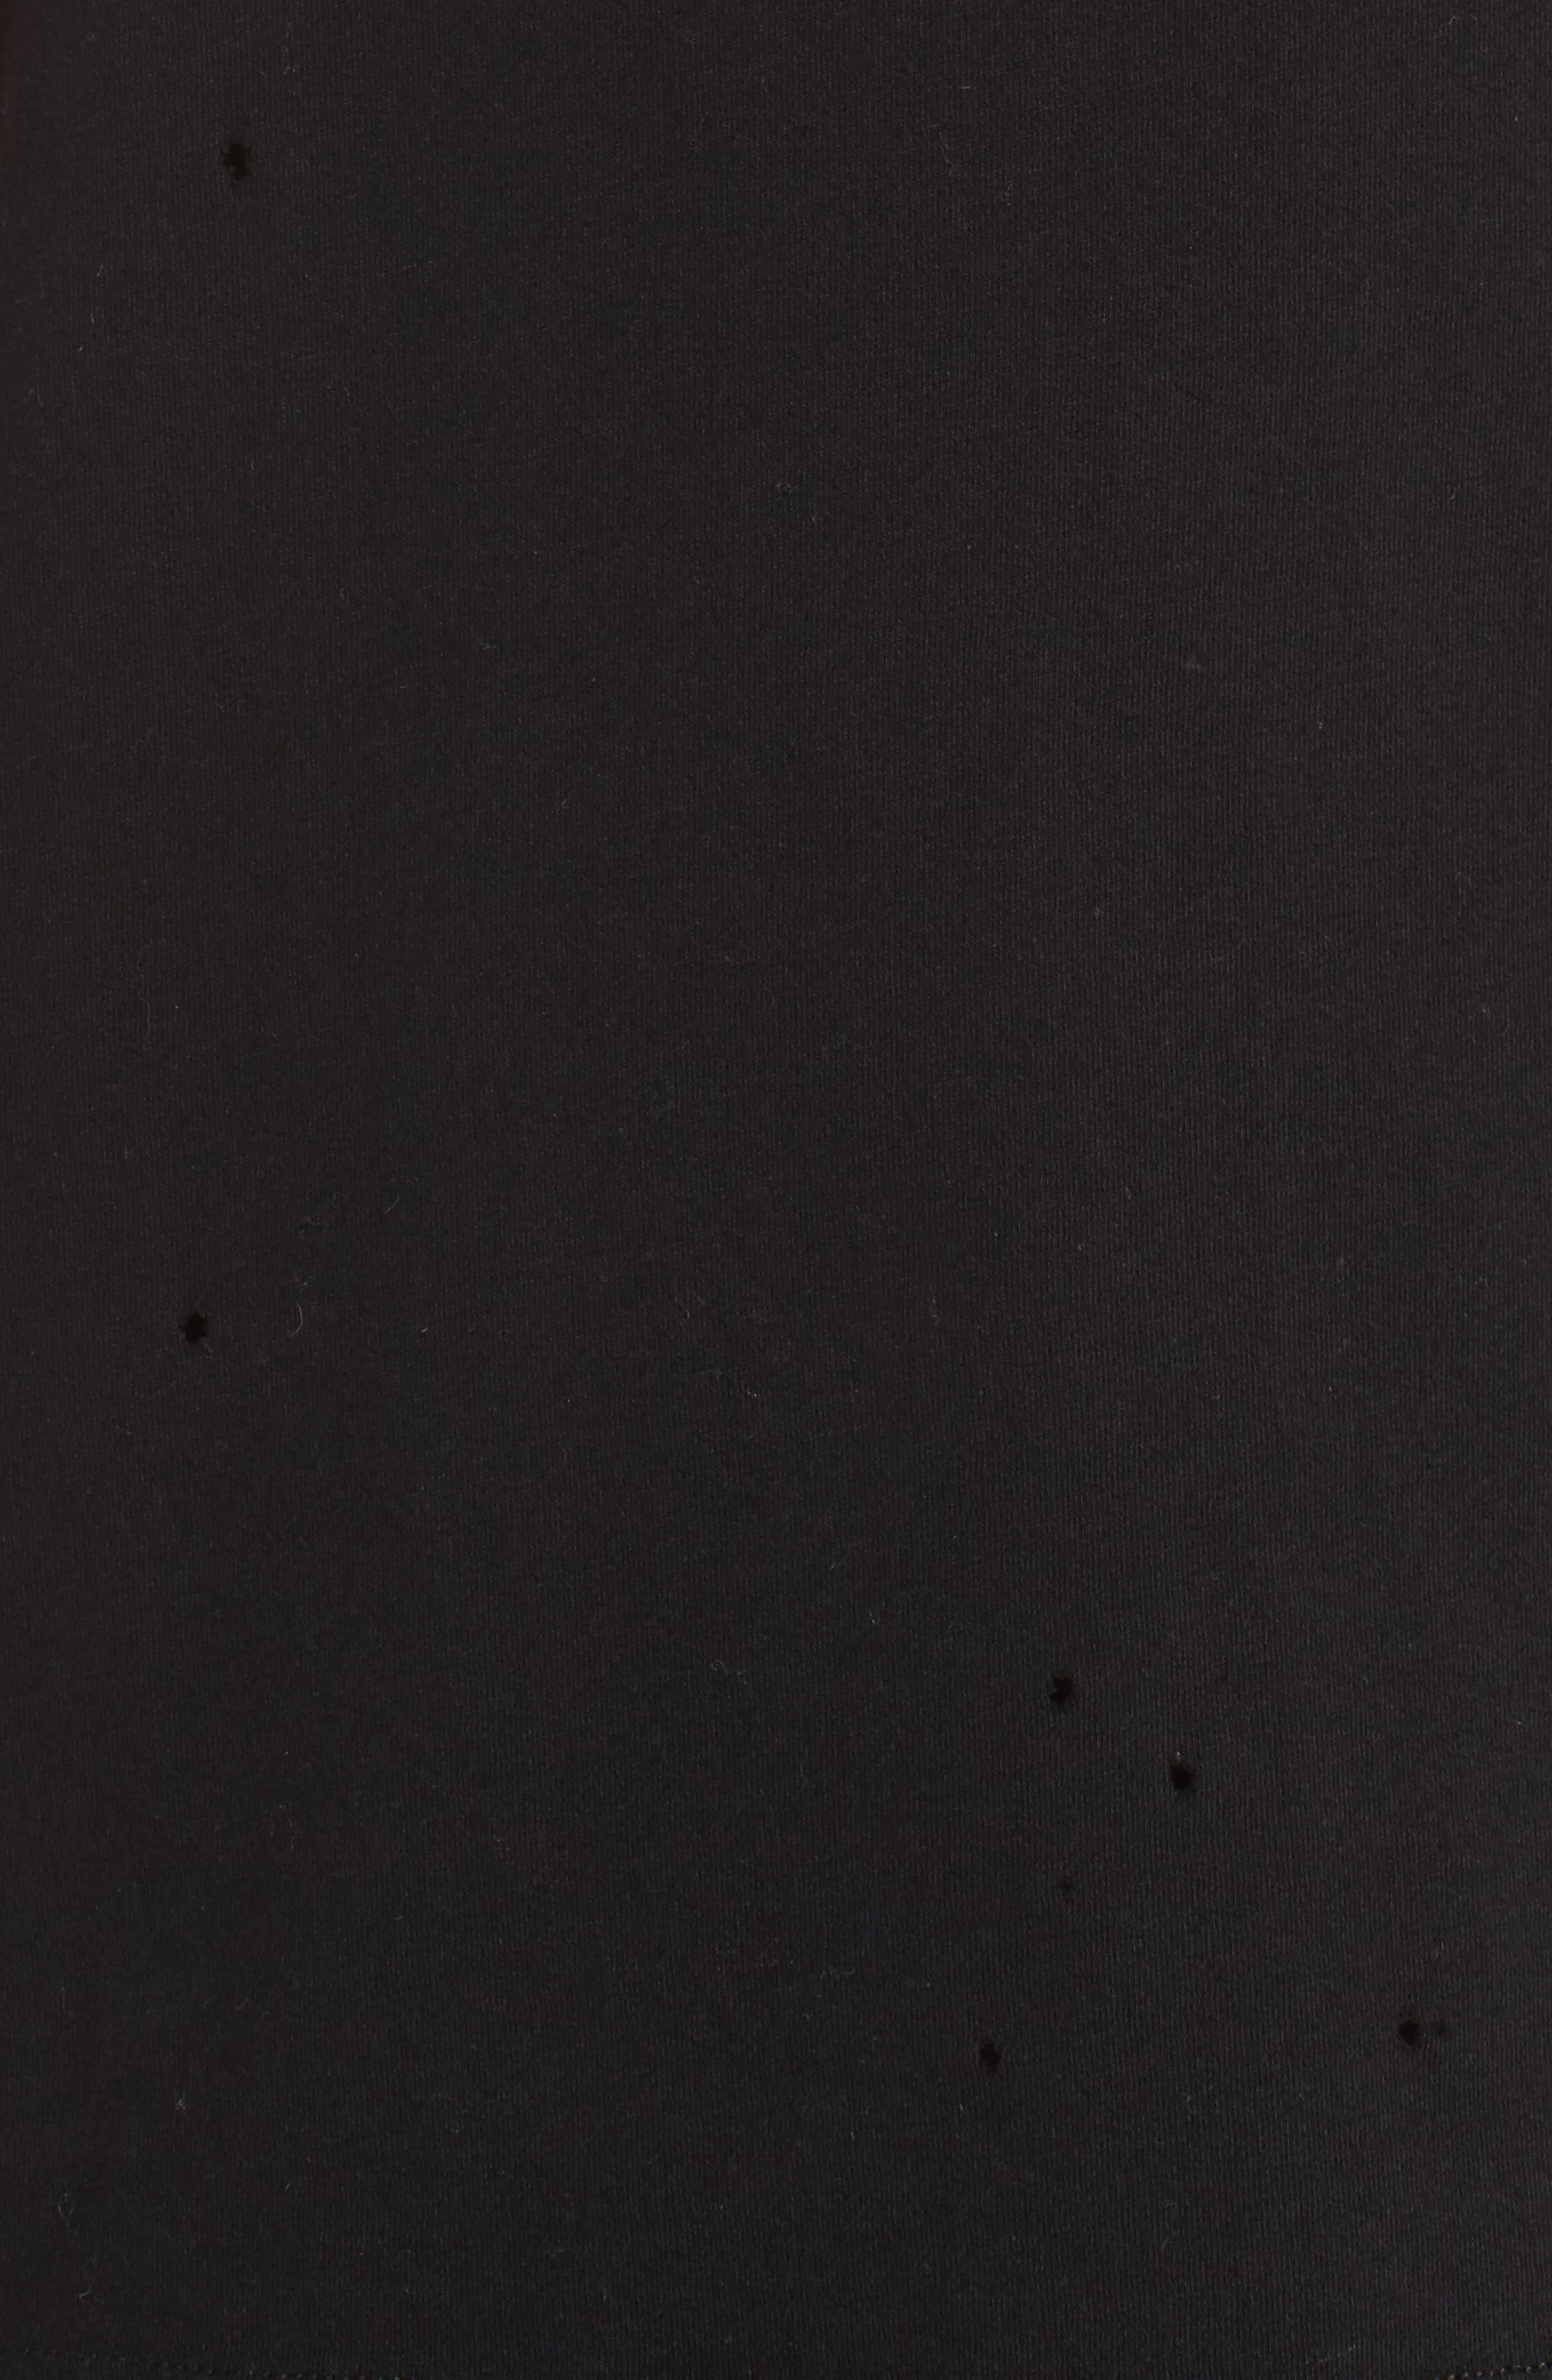 Distressed Tee,                             Alternate thumbnail 6, color,                             Black/ Distressed Holes